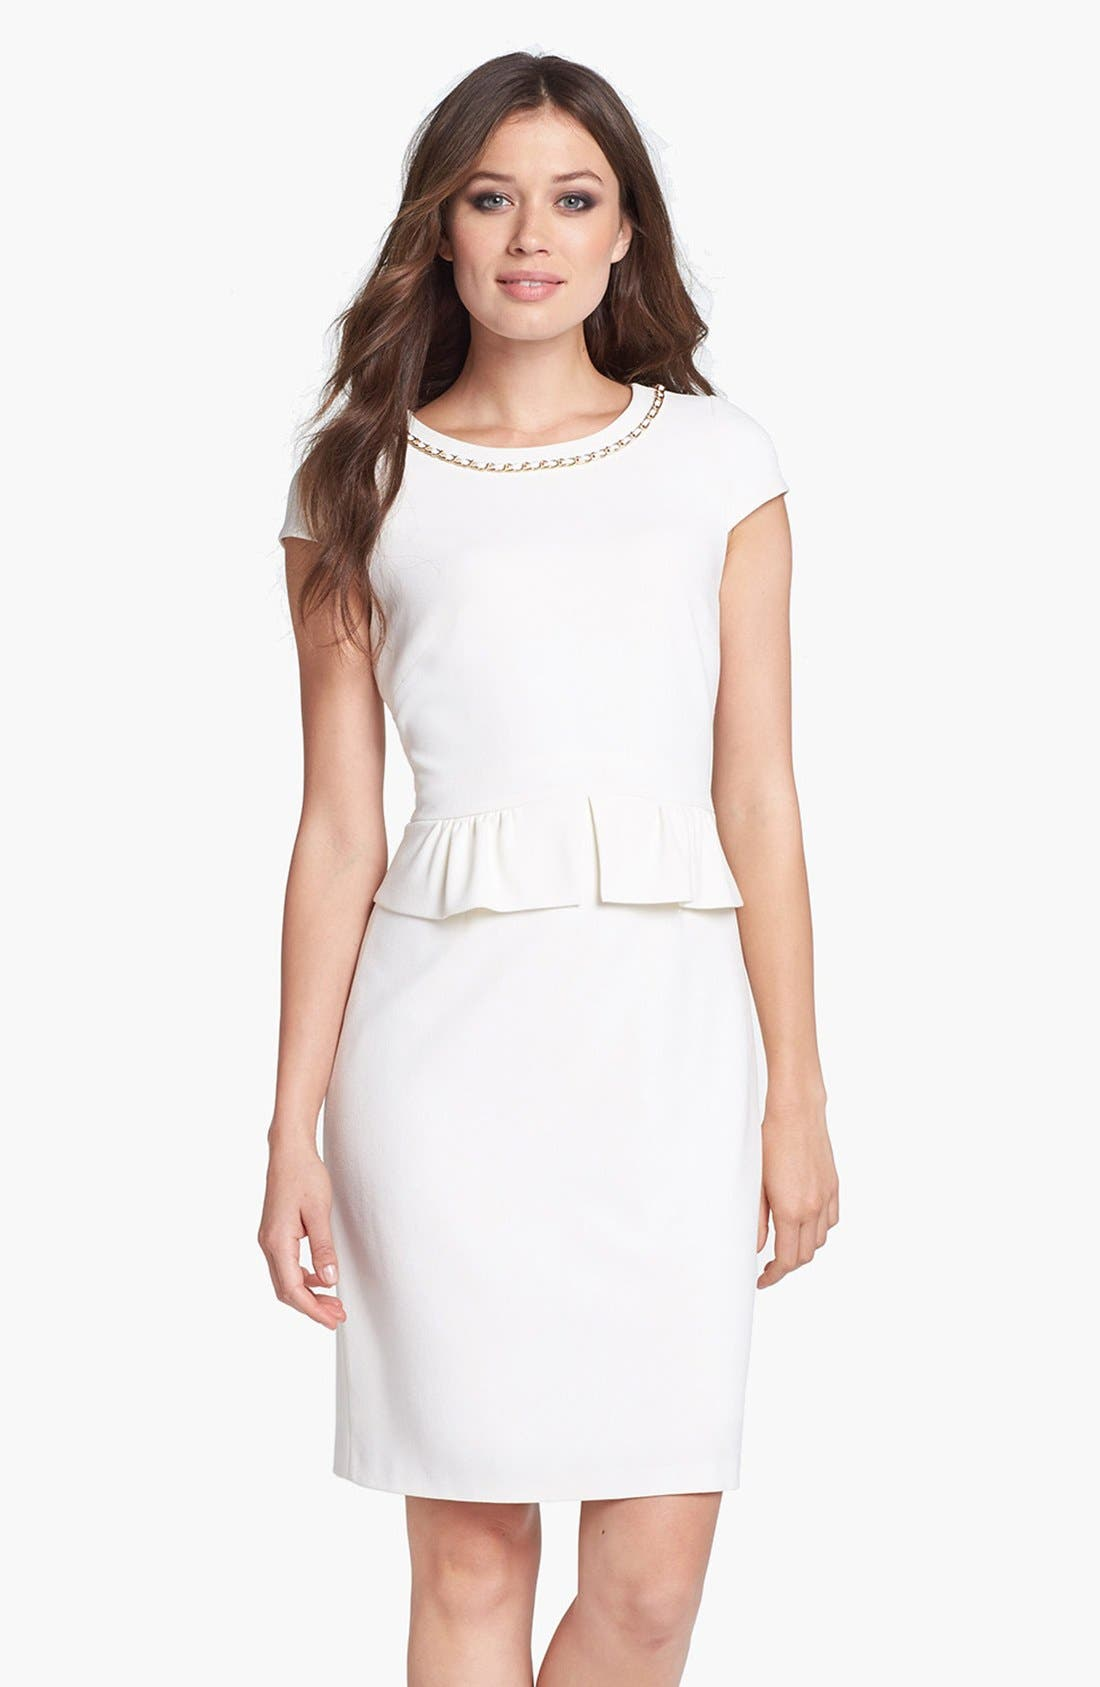 Alternate Image 1 Selected - Tahari Chain Detail Stretch Crepe Peplum Sheath Dress